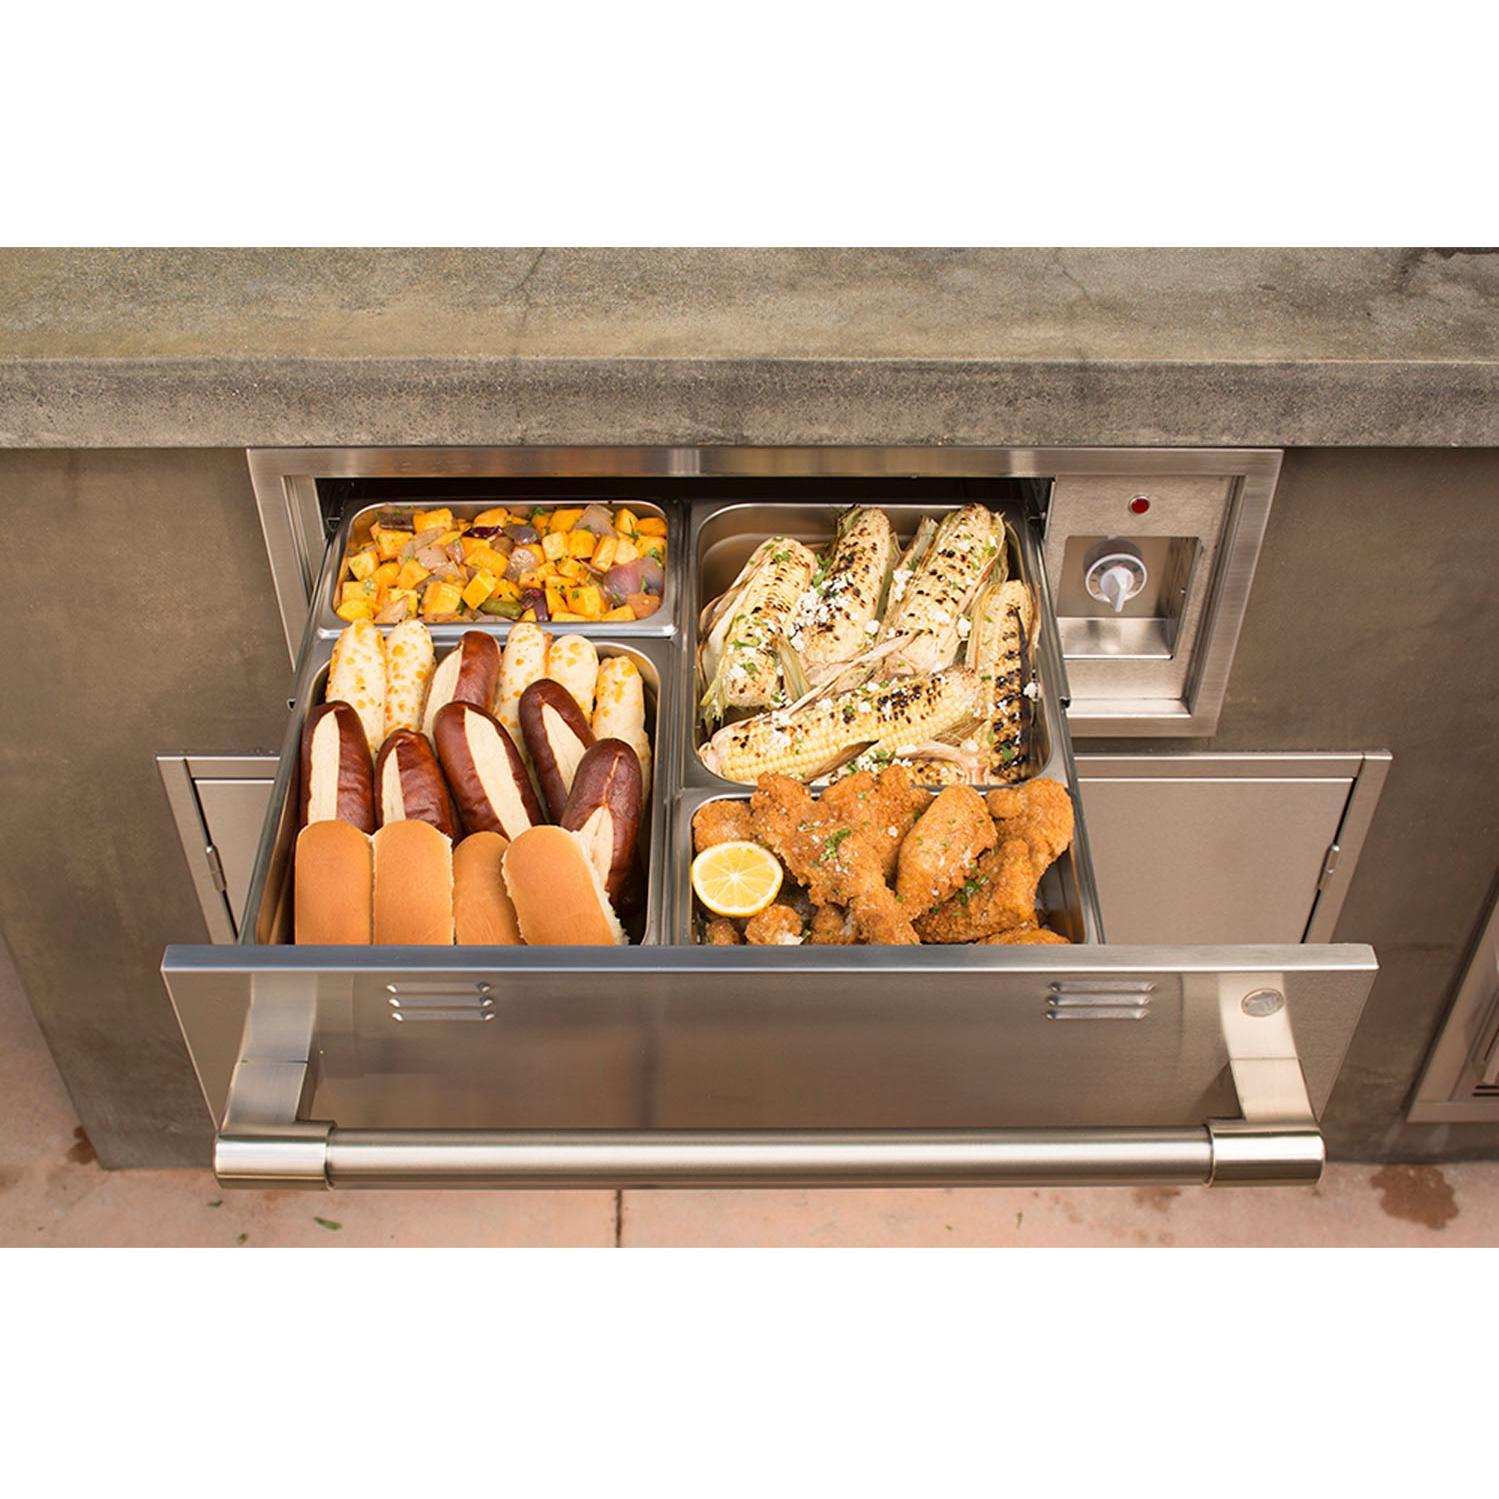 Alfresco 30-Inch Electric Warming Drawer - AXEWD-30 2910676